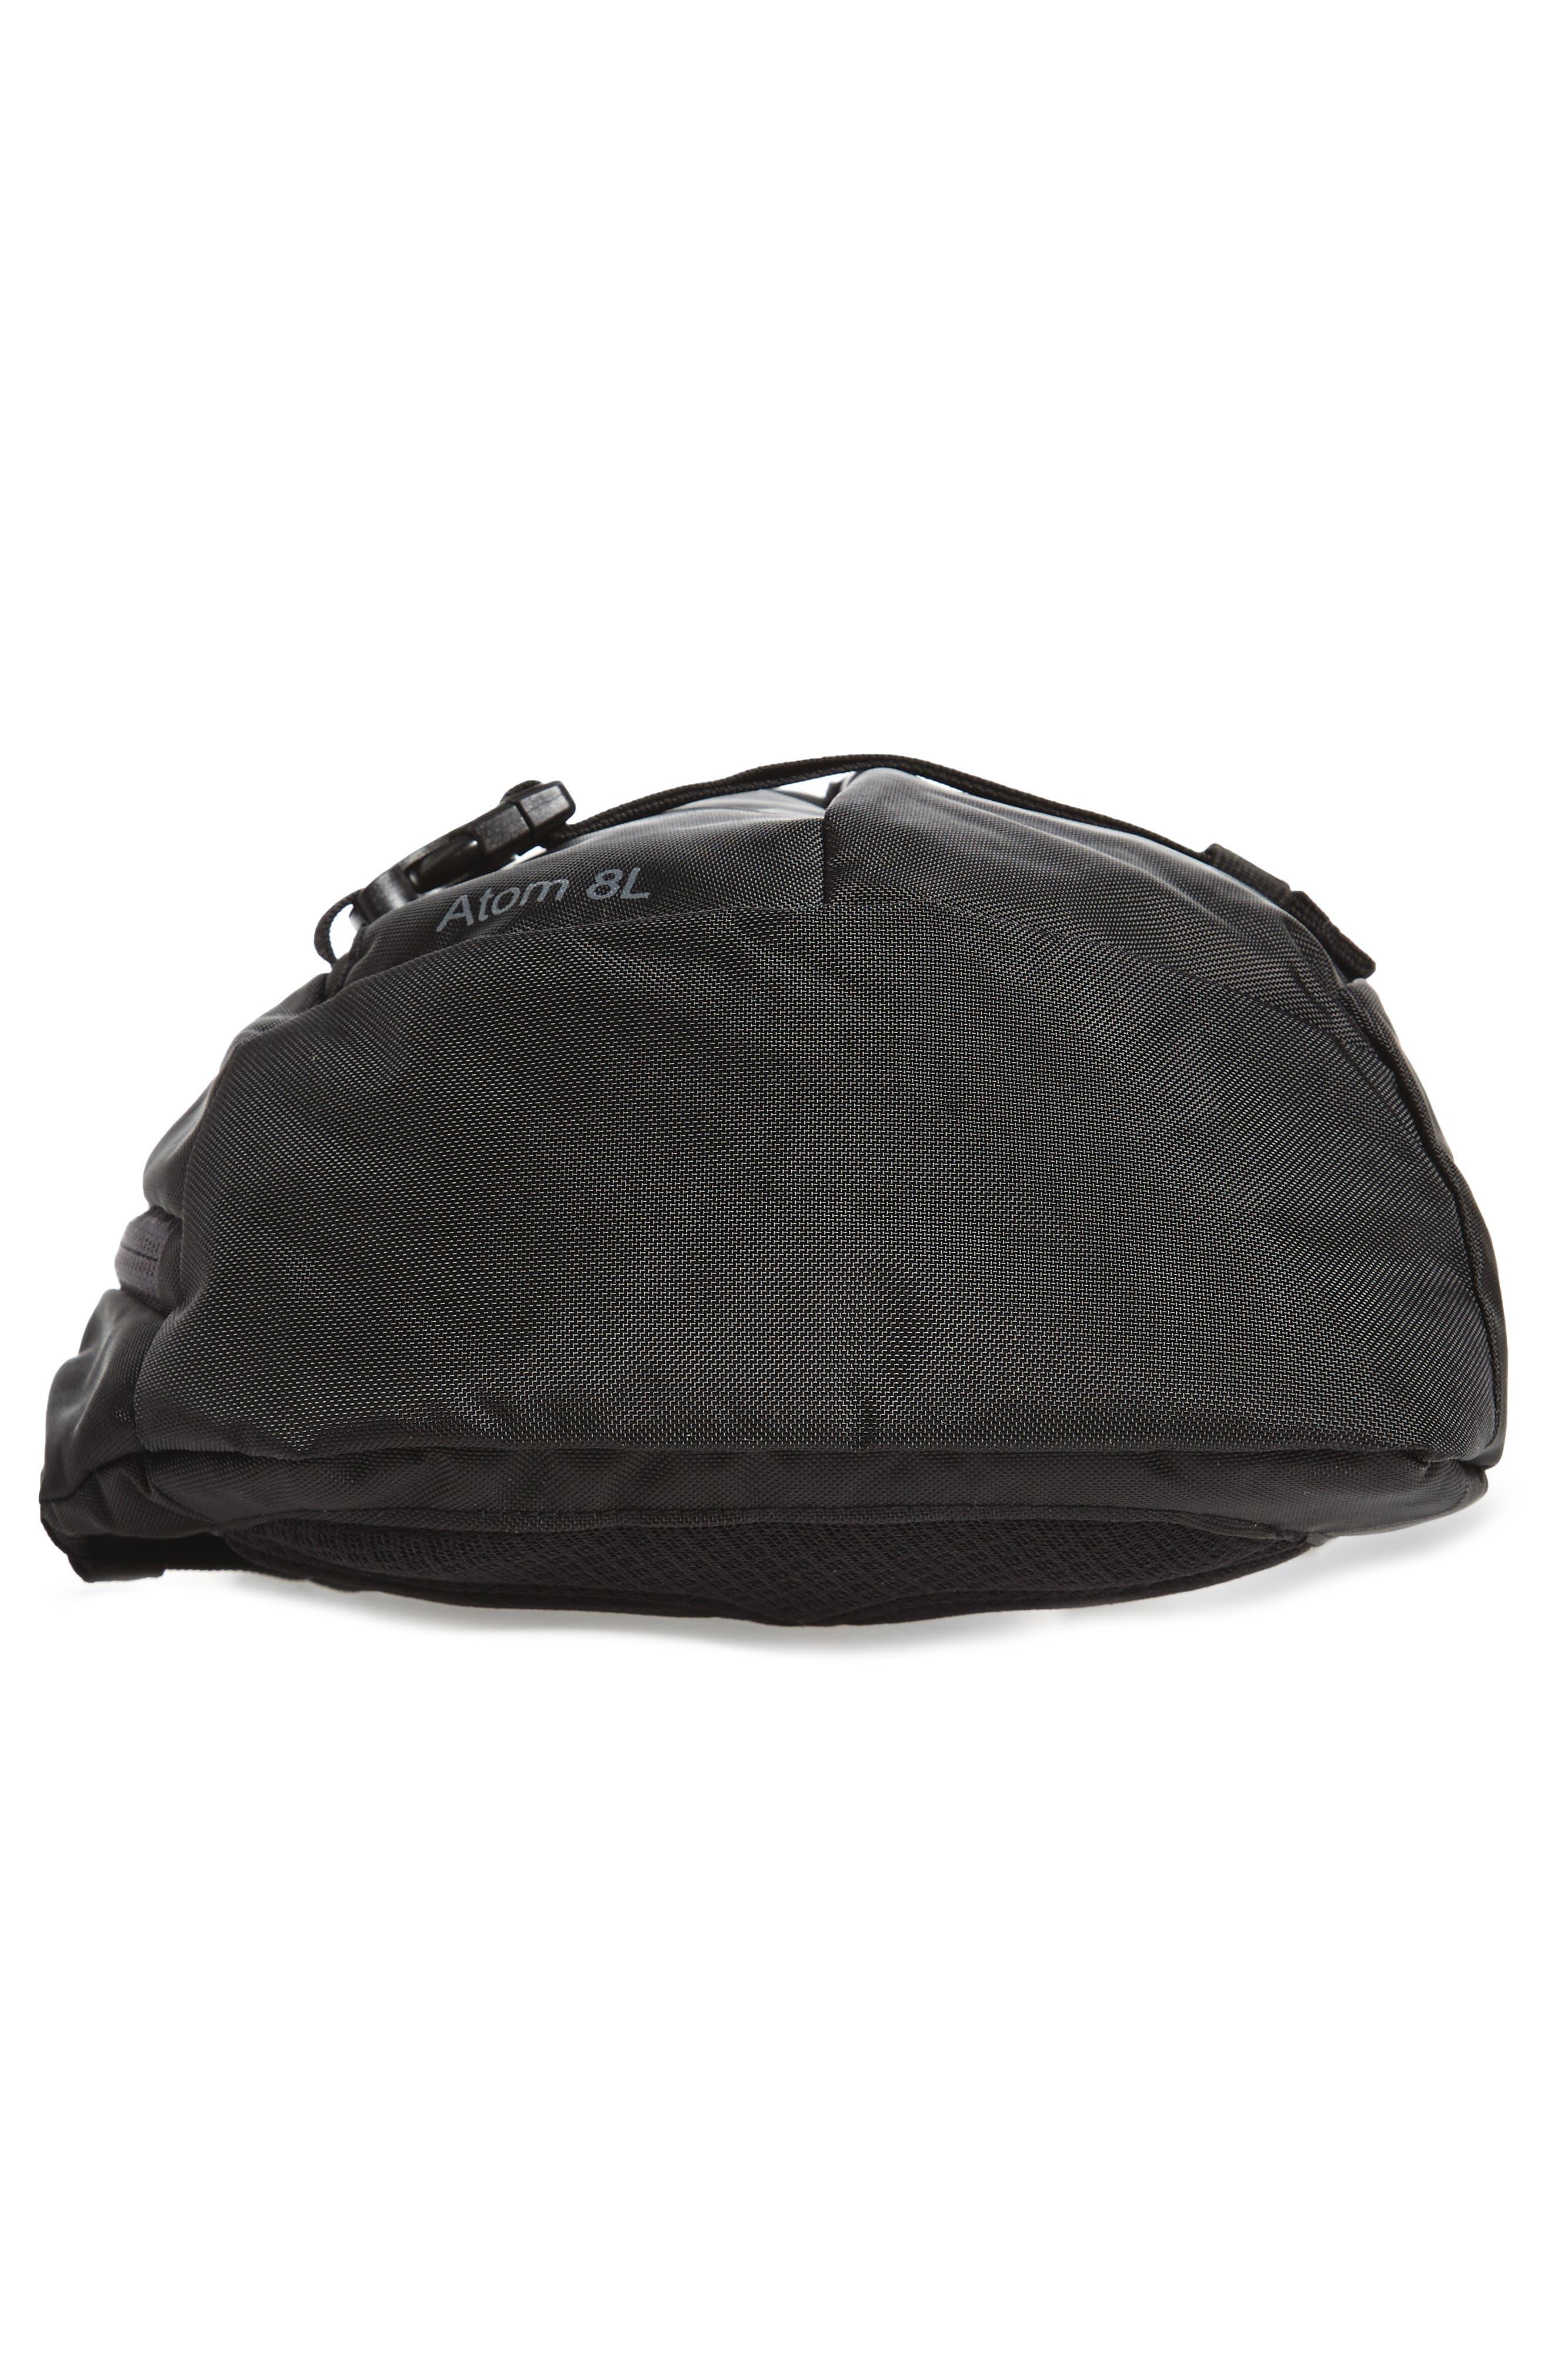 PATAGONIA, Atom 8L Sling Backpack, Alternate thumbnail 7, color, BLACK